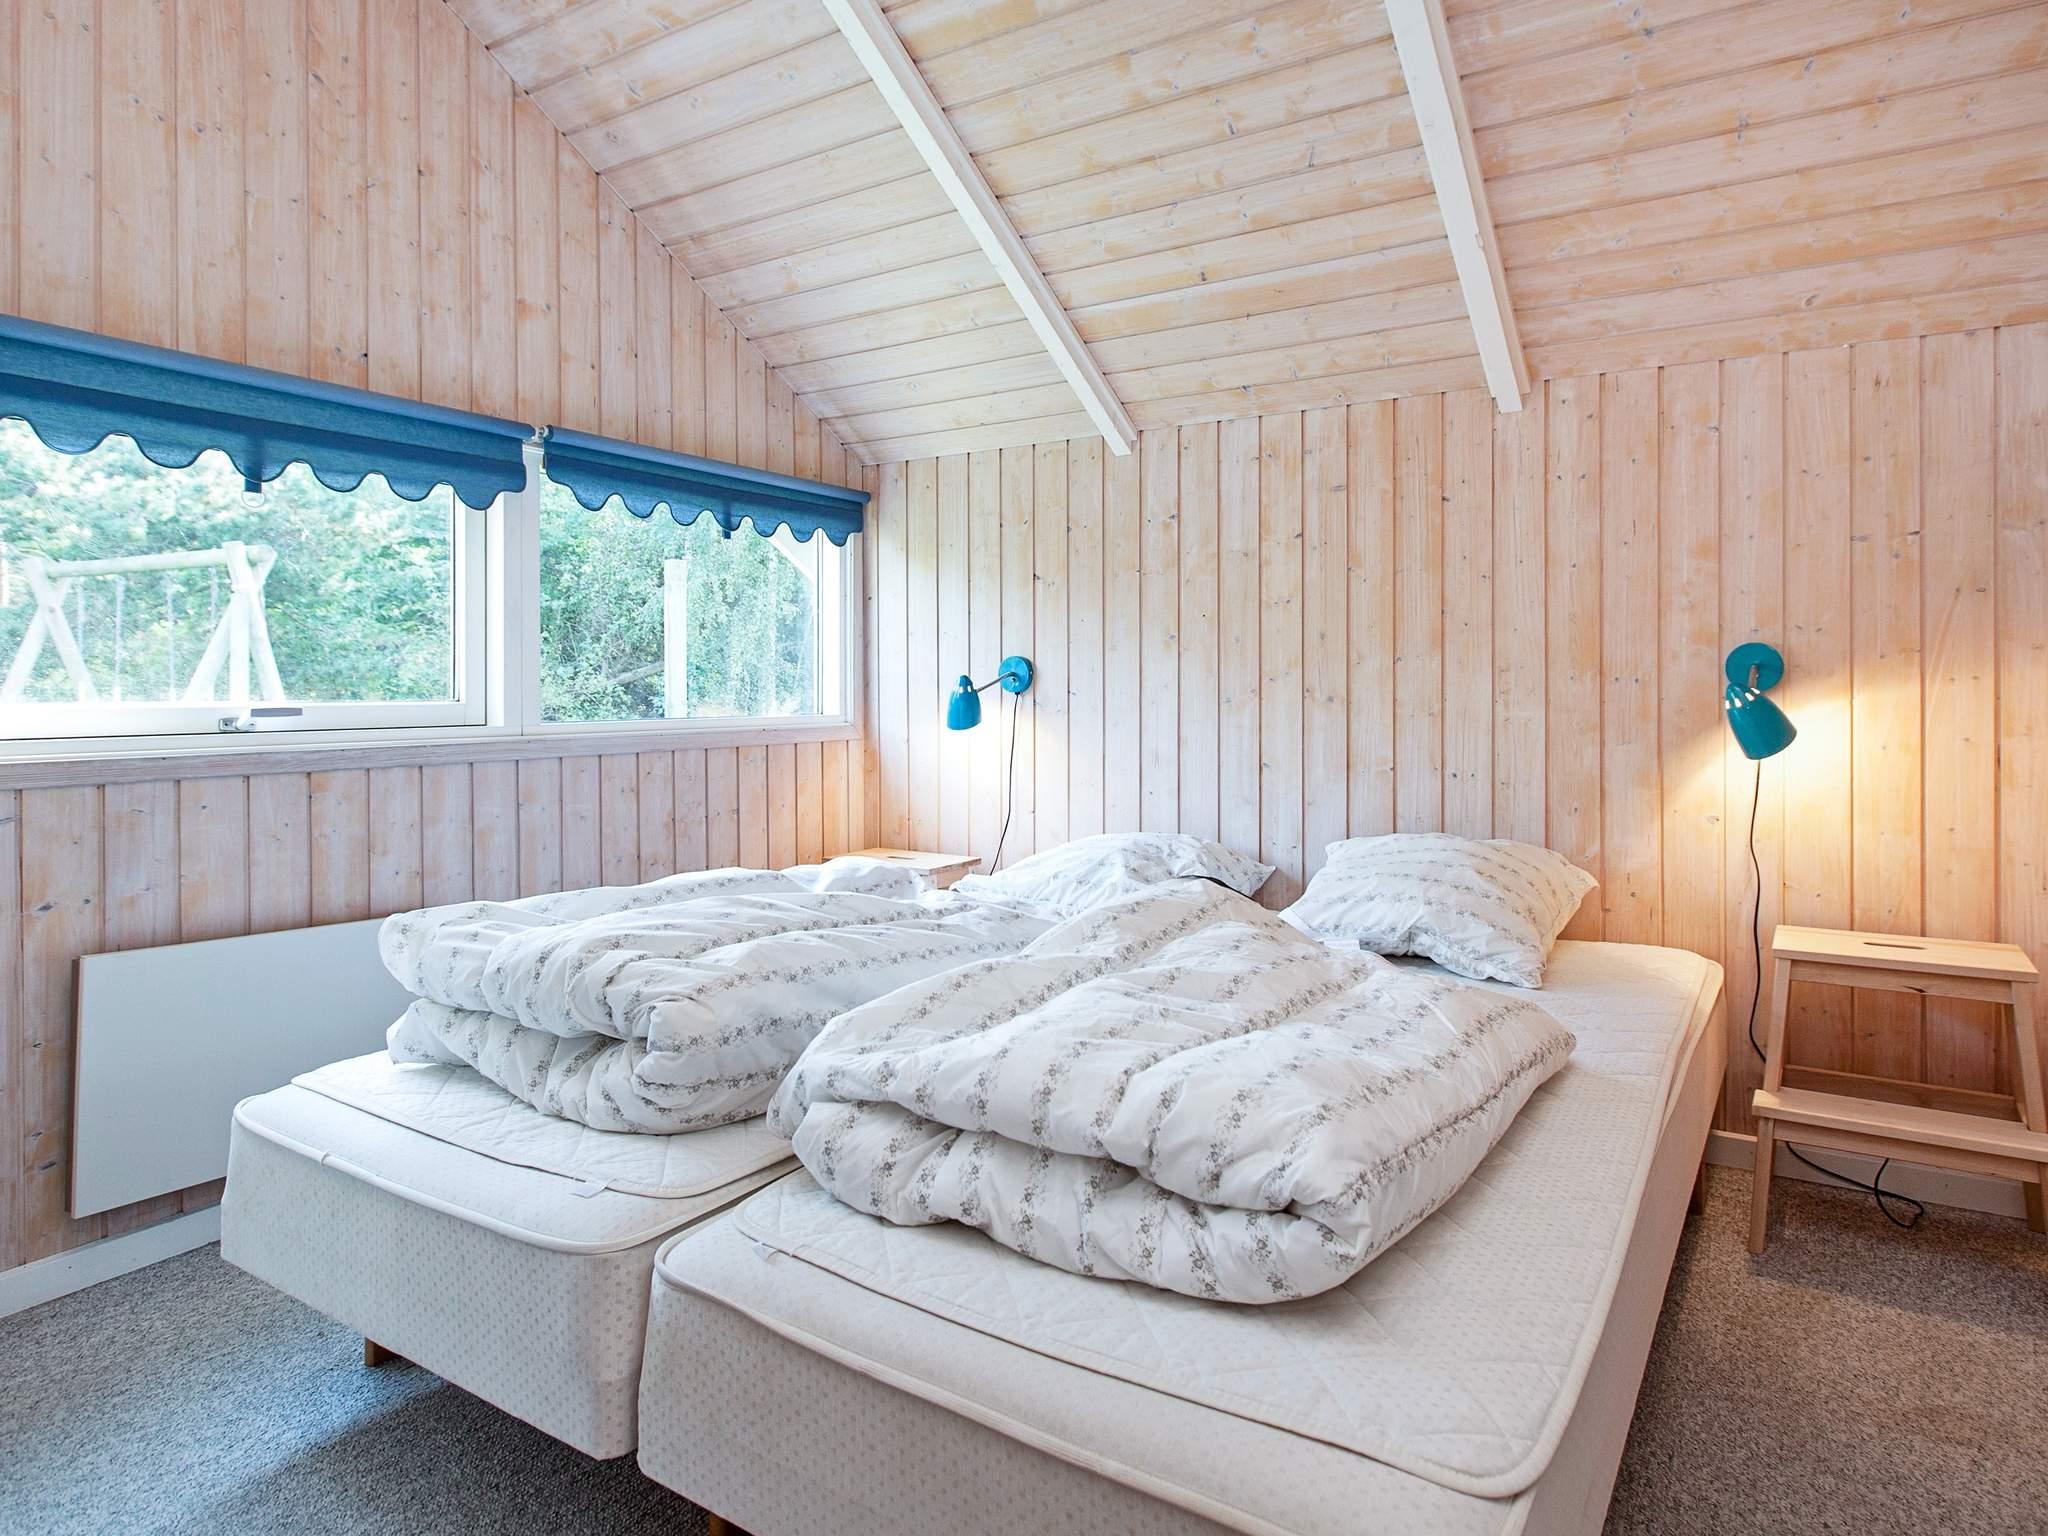 Ferienhaus Holløselund Strand (87423), Holløse, , Nordseeland, Dänemark, Bild 11